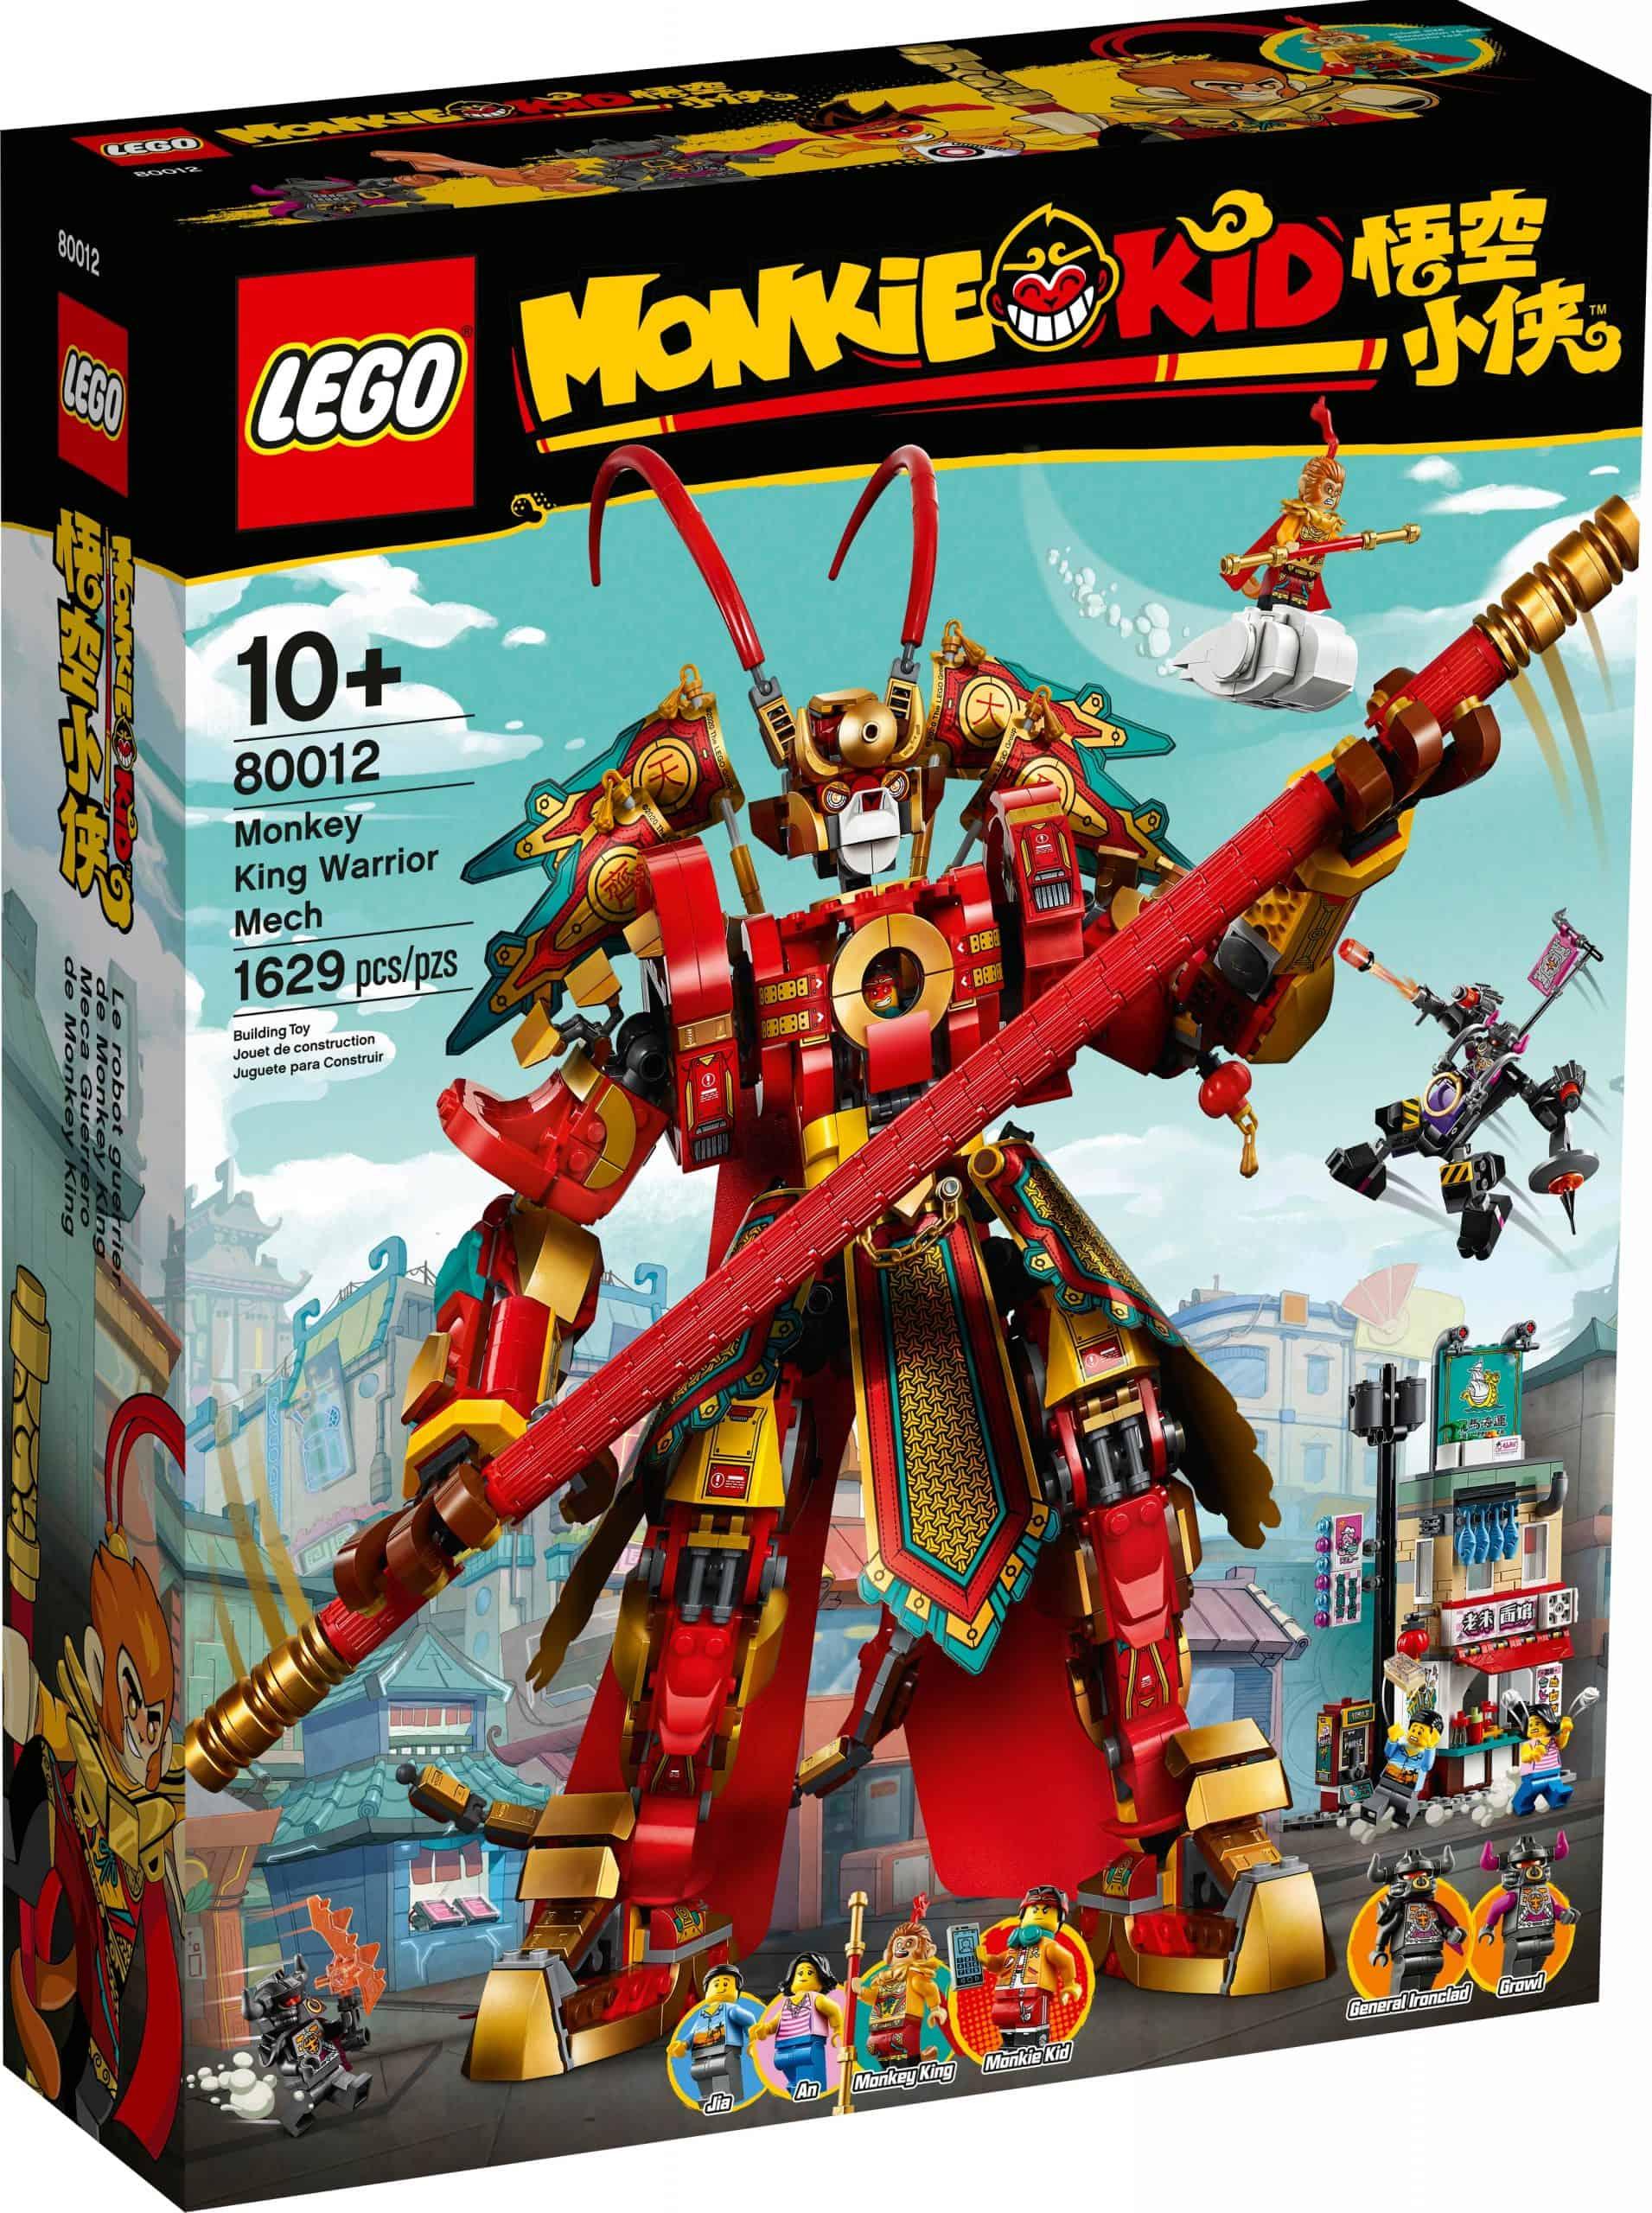 lego 80012 monkey kings krigerrobot scaled